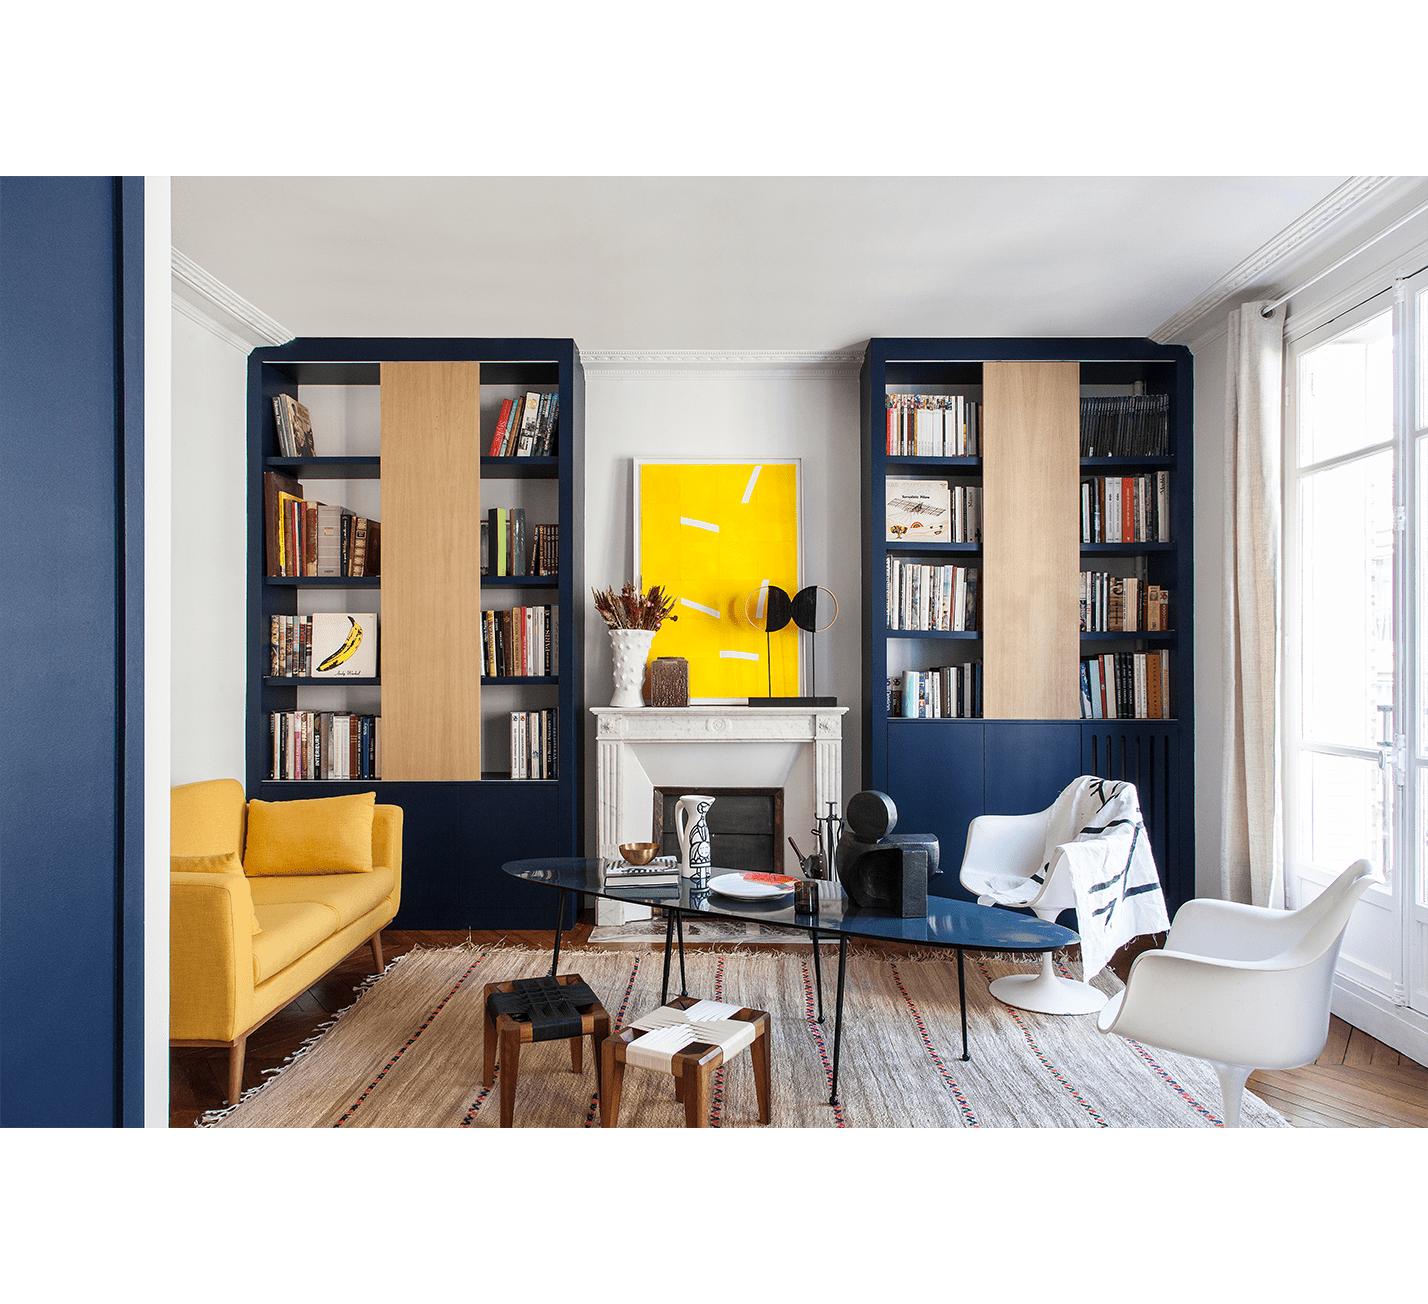 Projet-Alfred-Atelier-Steve-Pauline-Borgia-Architecture-interieur-01-min-1